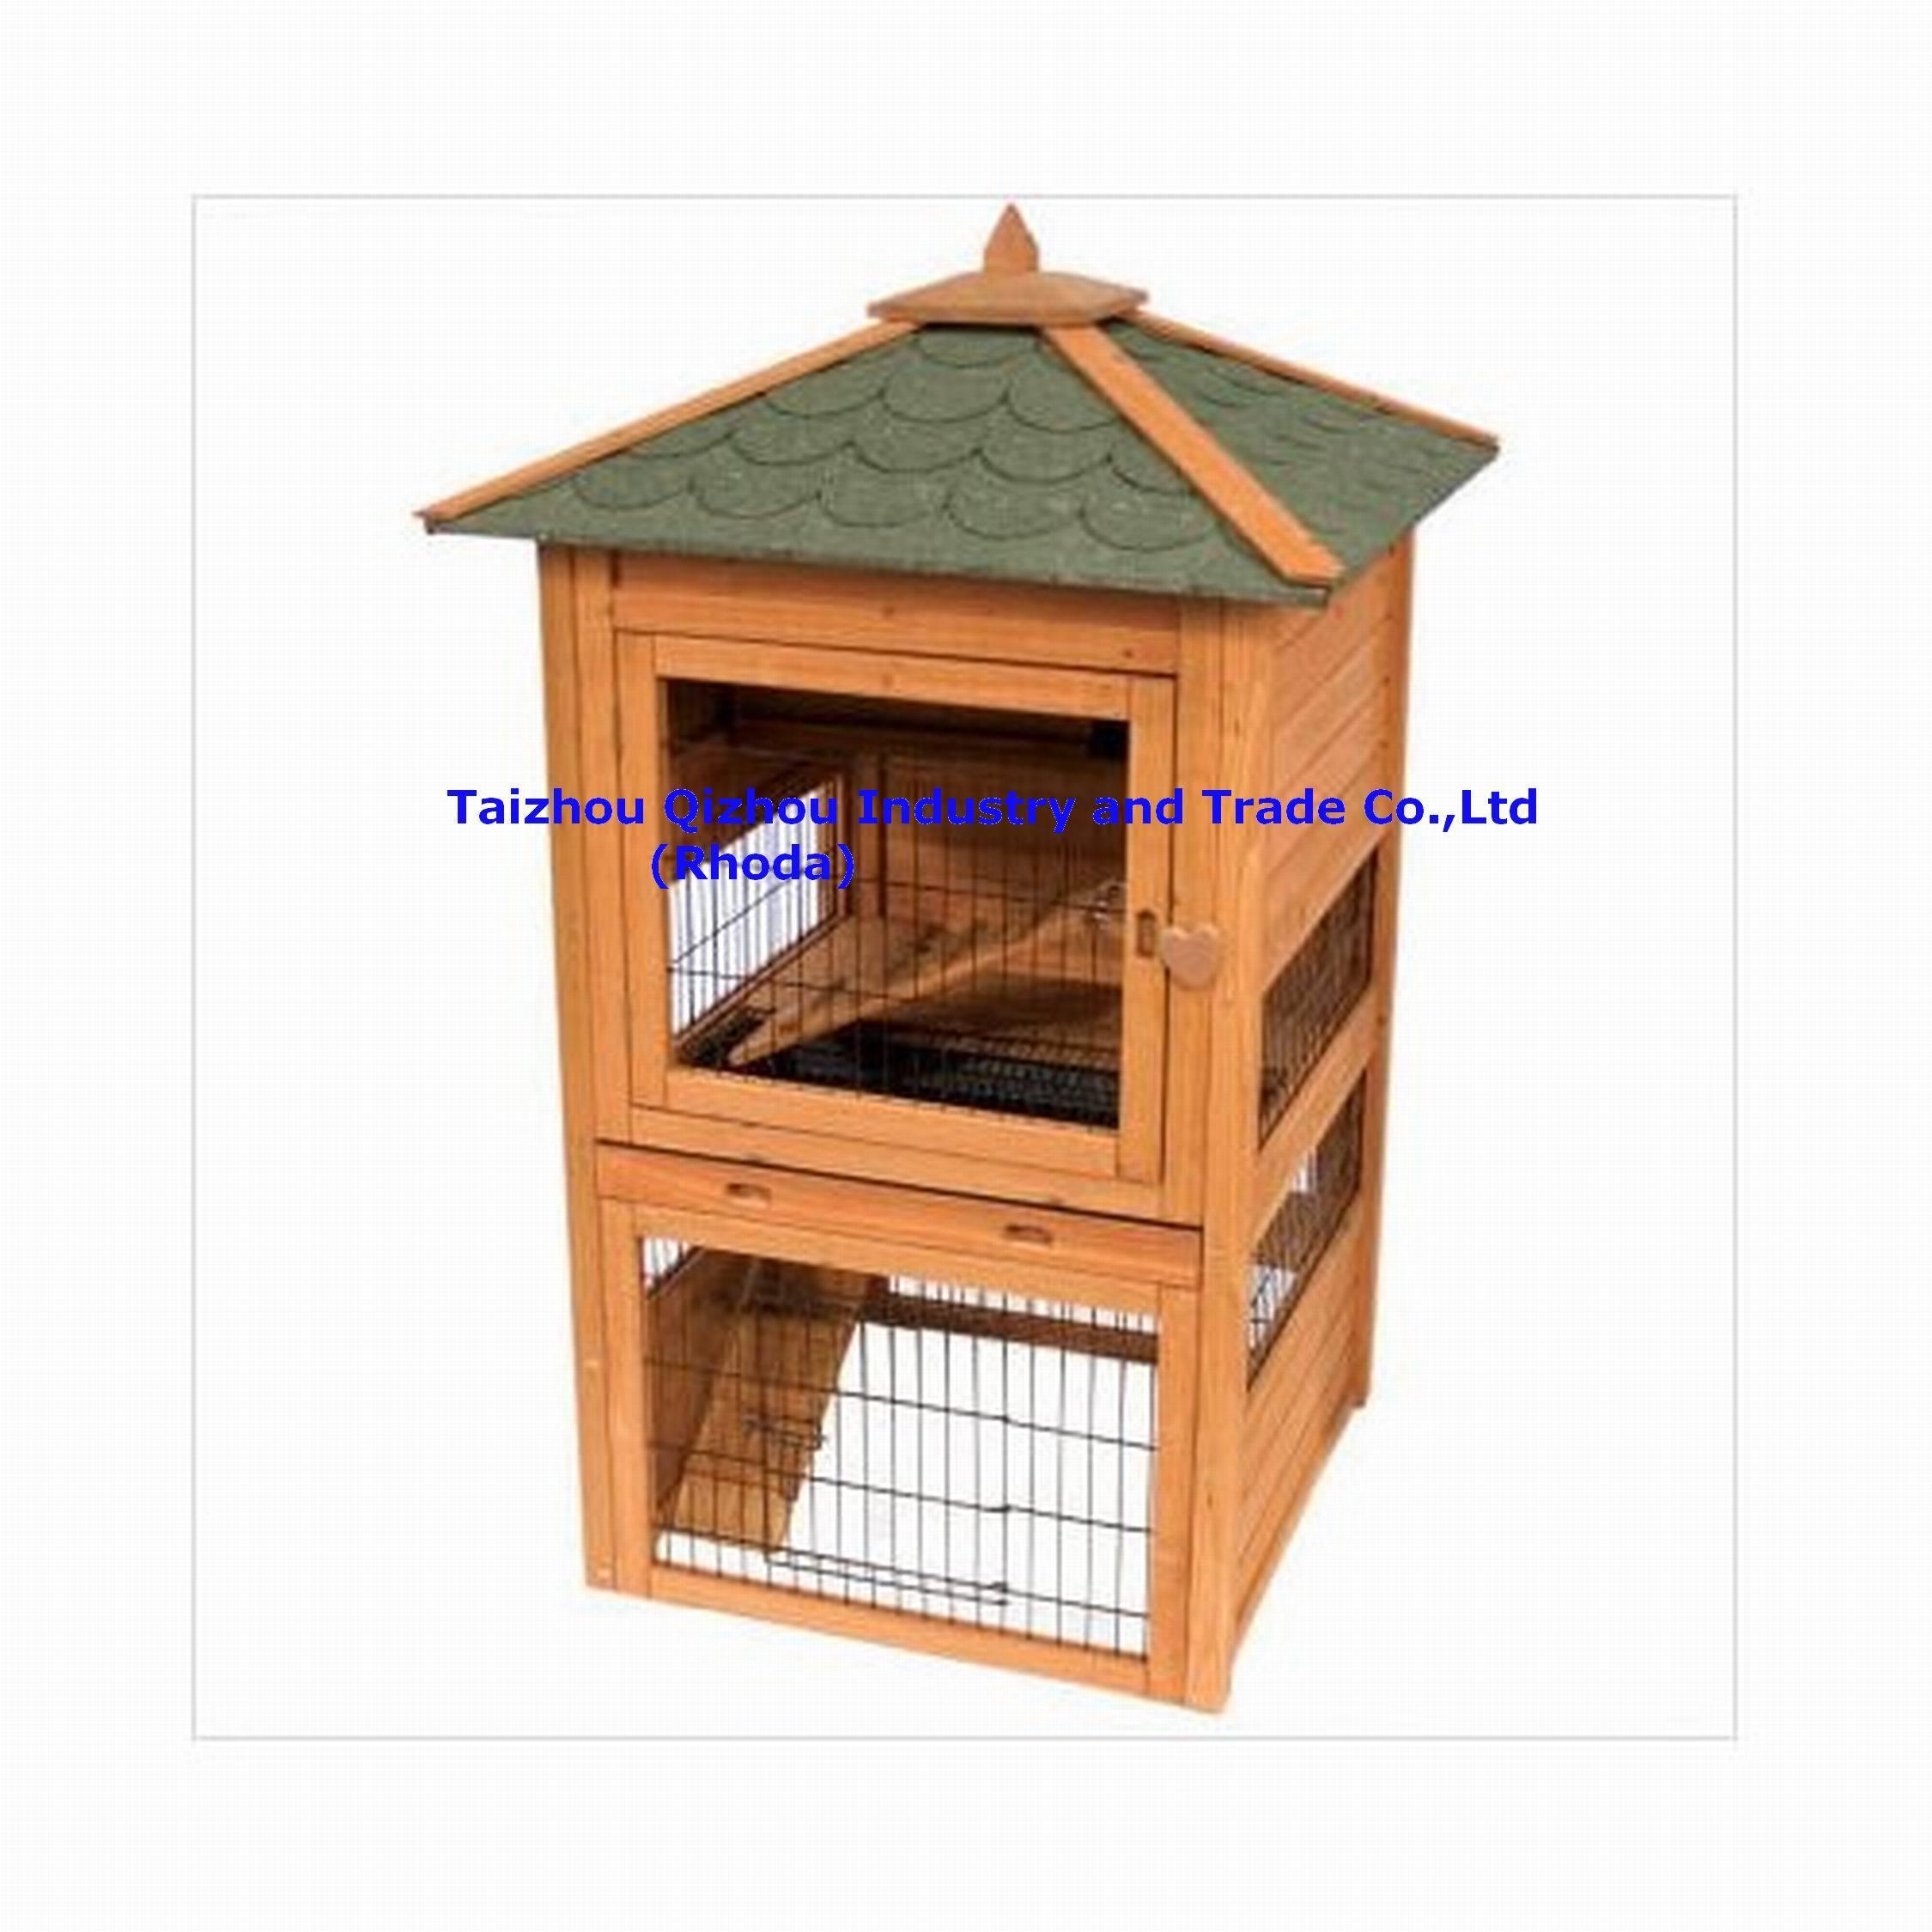 Casa del conejo qzr9001 casa del conejo qzr9001 - Casa conejo ...